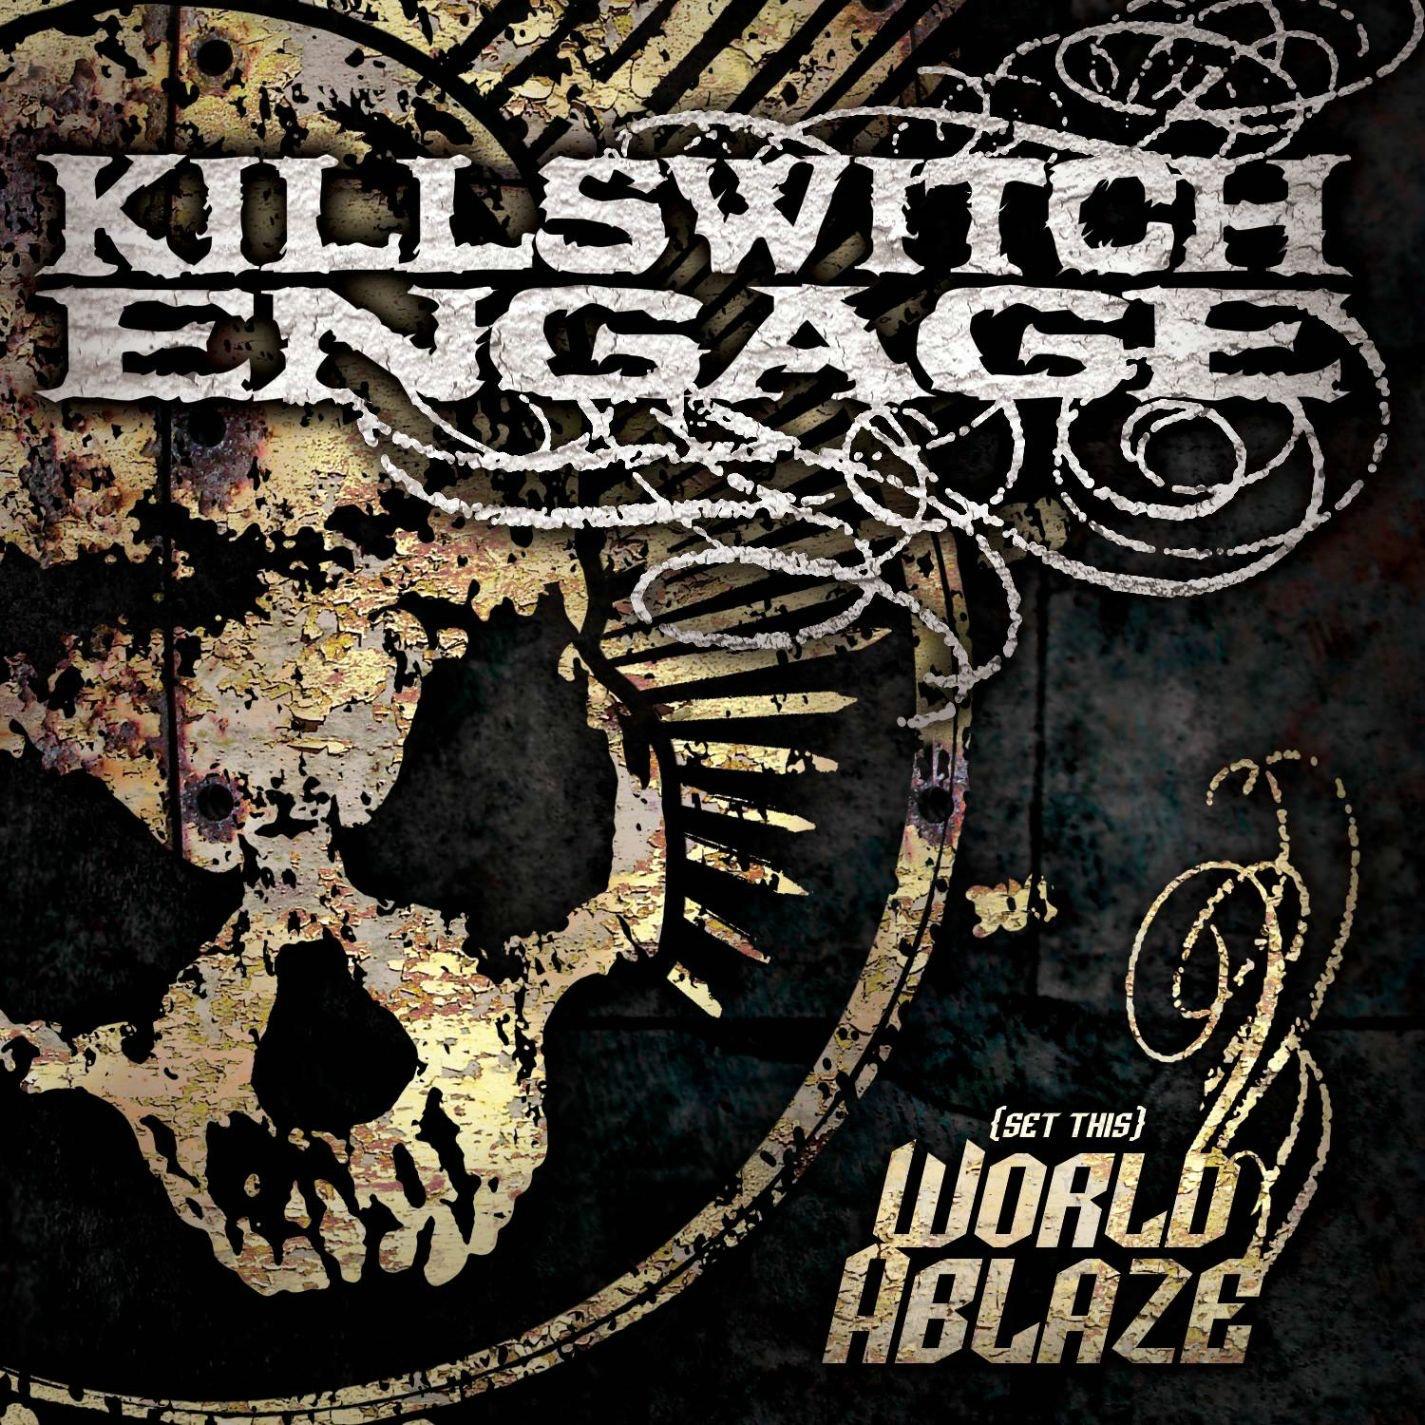 Killswitch Engage album (Set This) World Ablaze